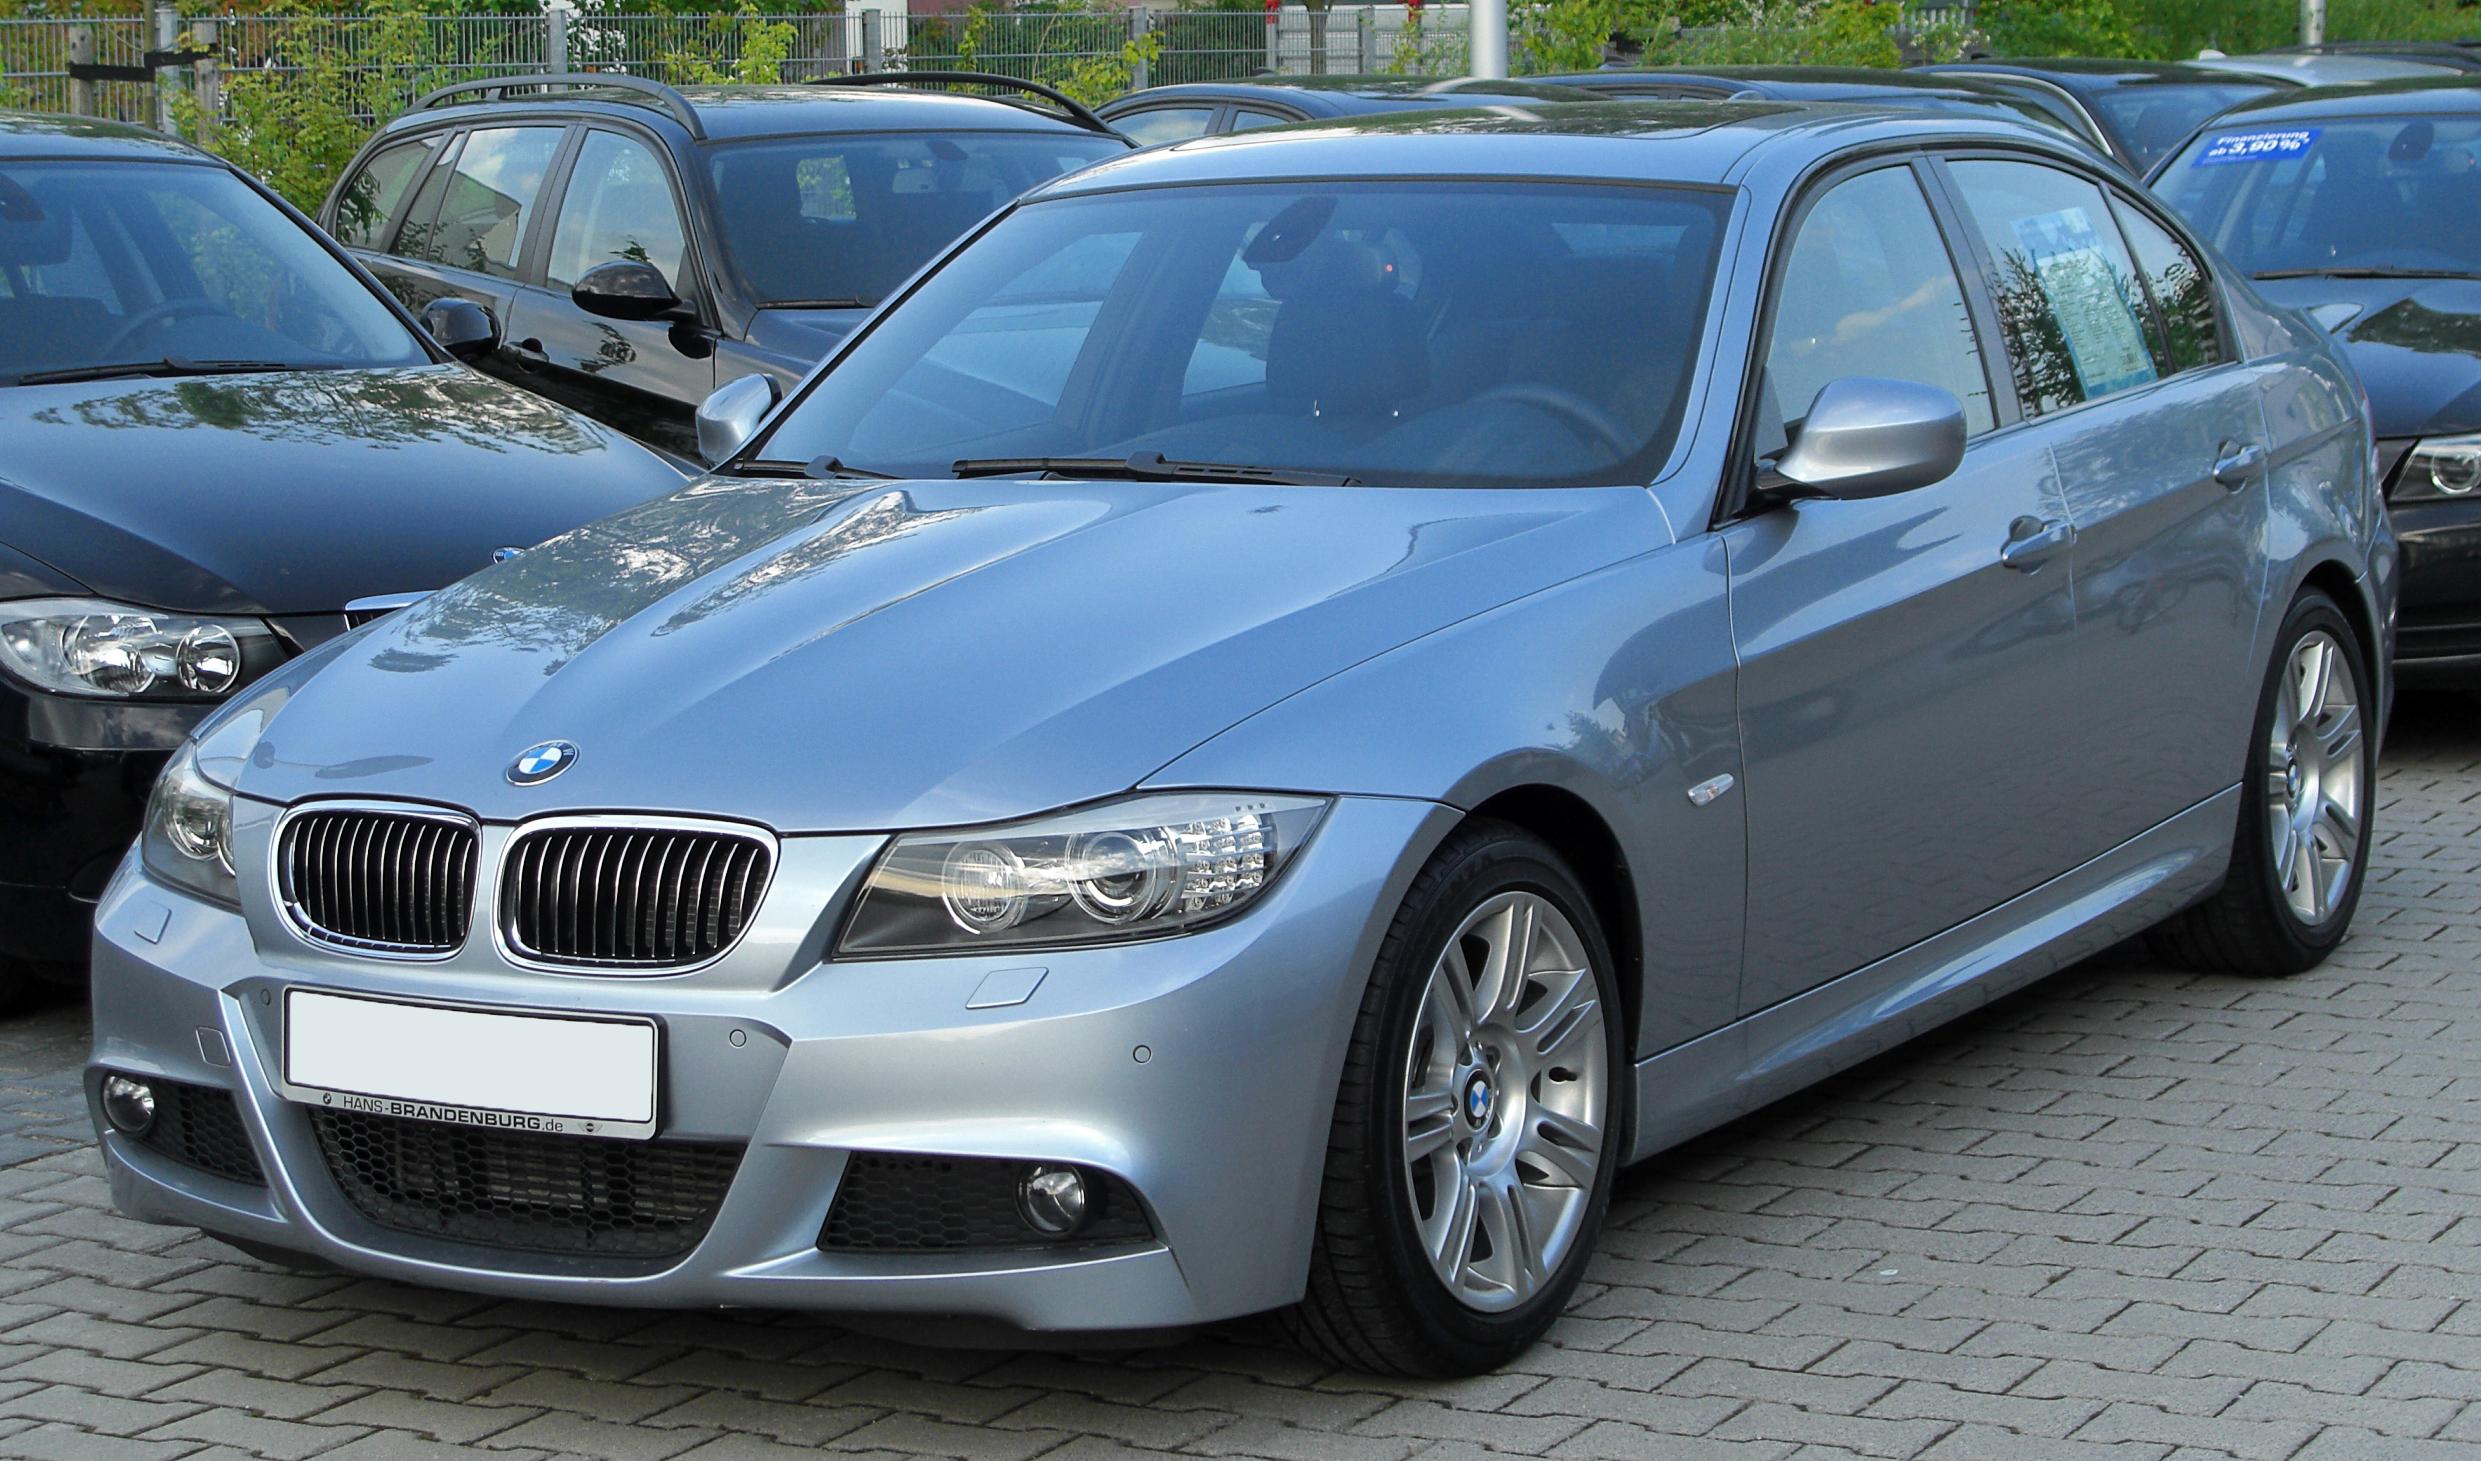 Bmw E90 Wiki >> File:BMW 325d M Sportpaket (E90) Facelift front 20100516.jpg - Wikimedia Commons